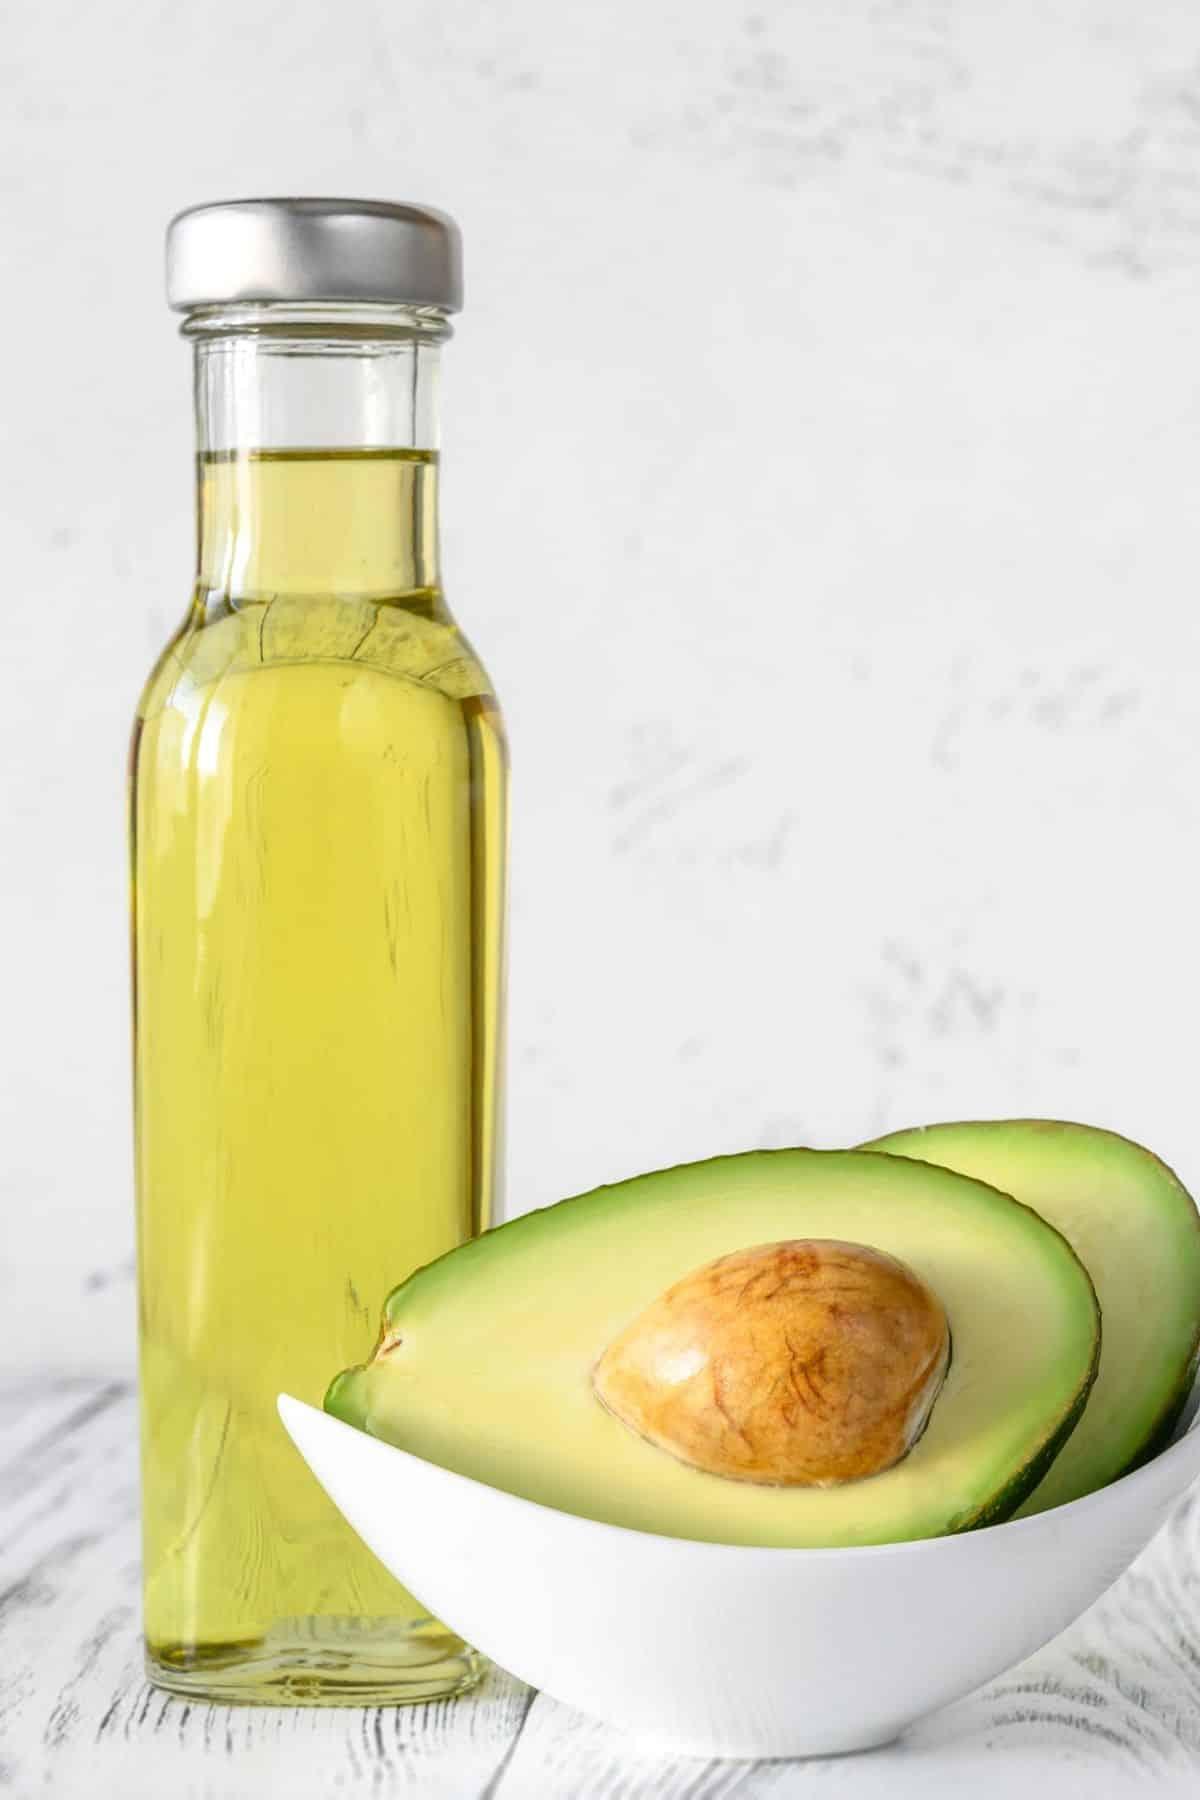 jar of avocado oil with a sliced fresh avocado next to it